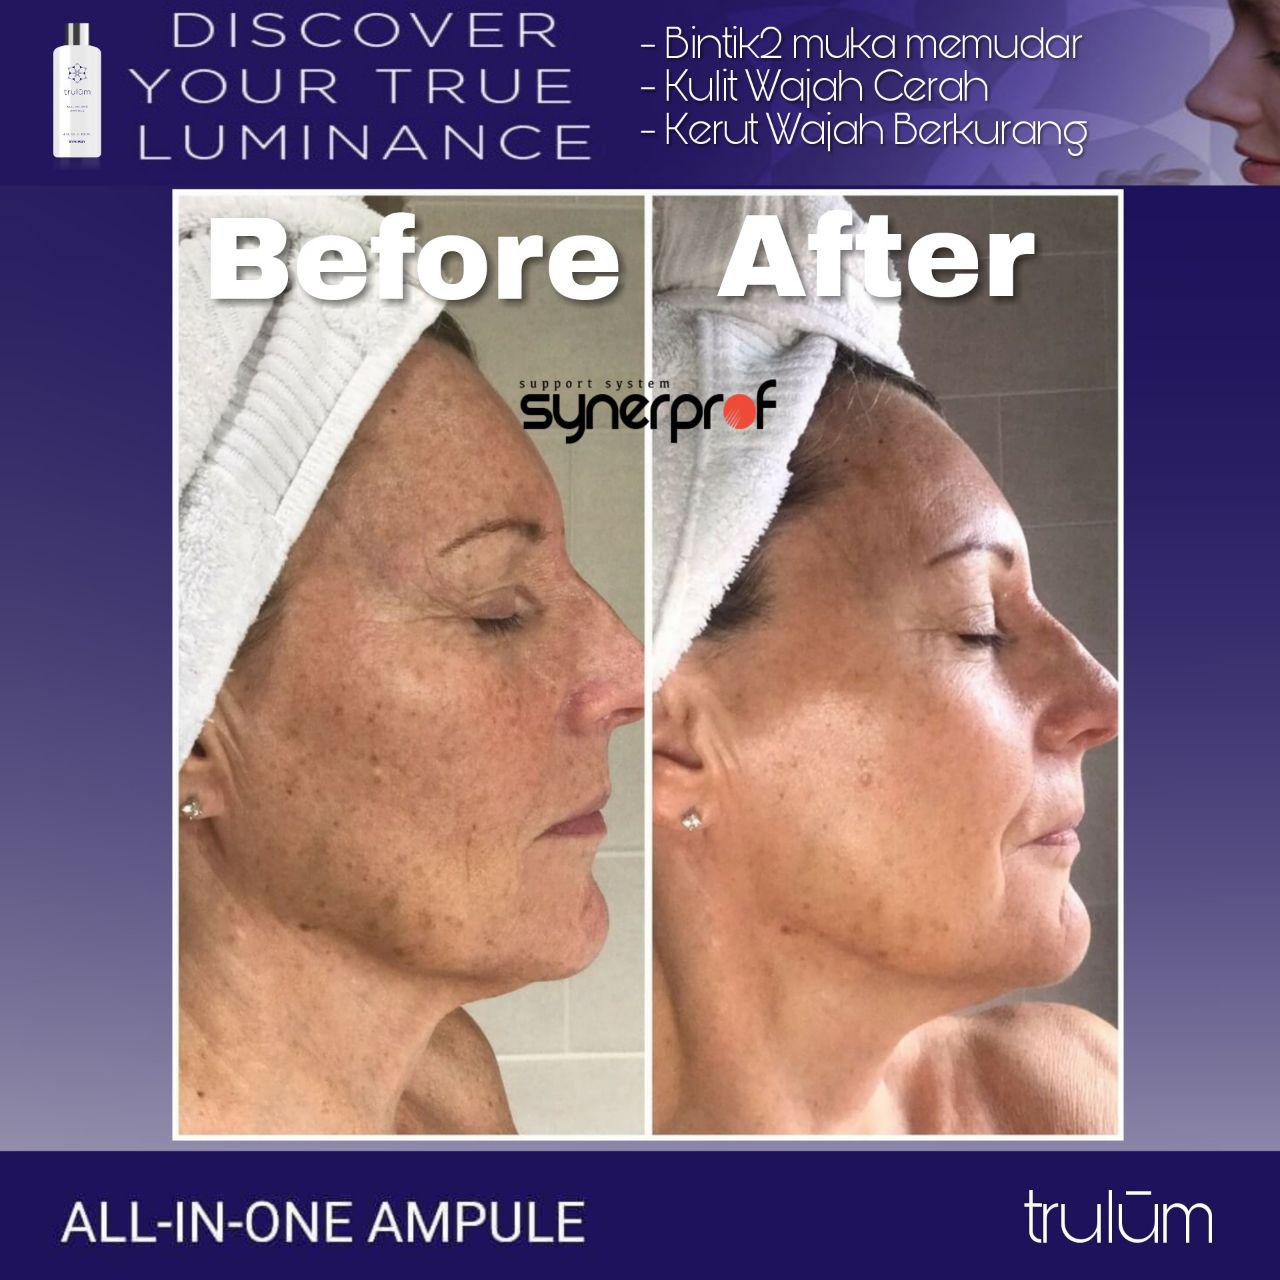 Klinik Kecantikan Trulum Cream Di Lambhuk, Ulee Kareng WA: 08112338376